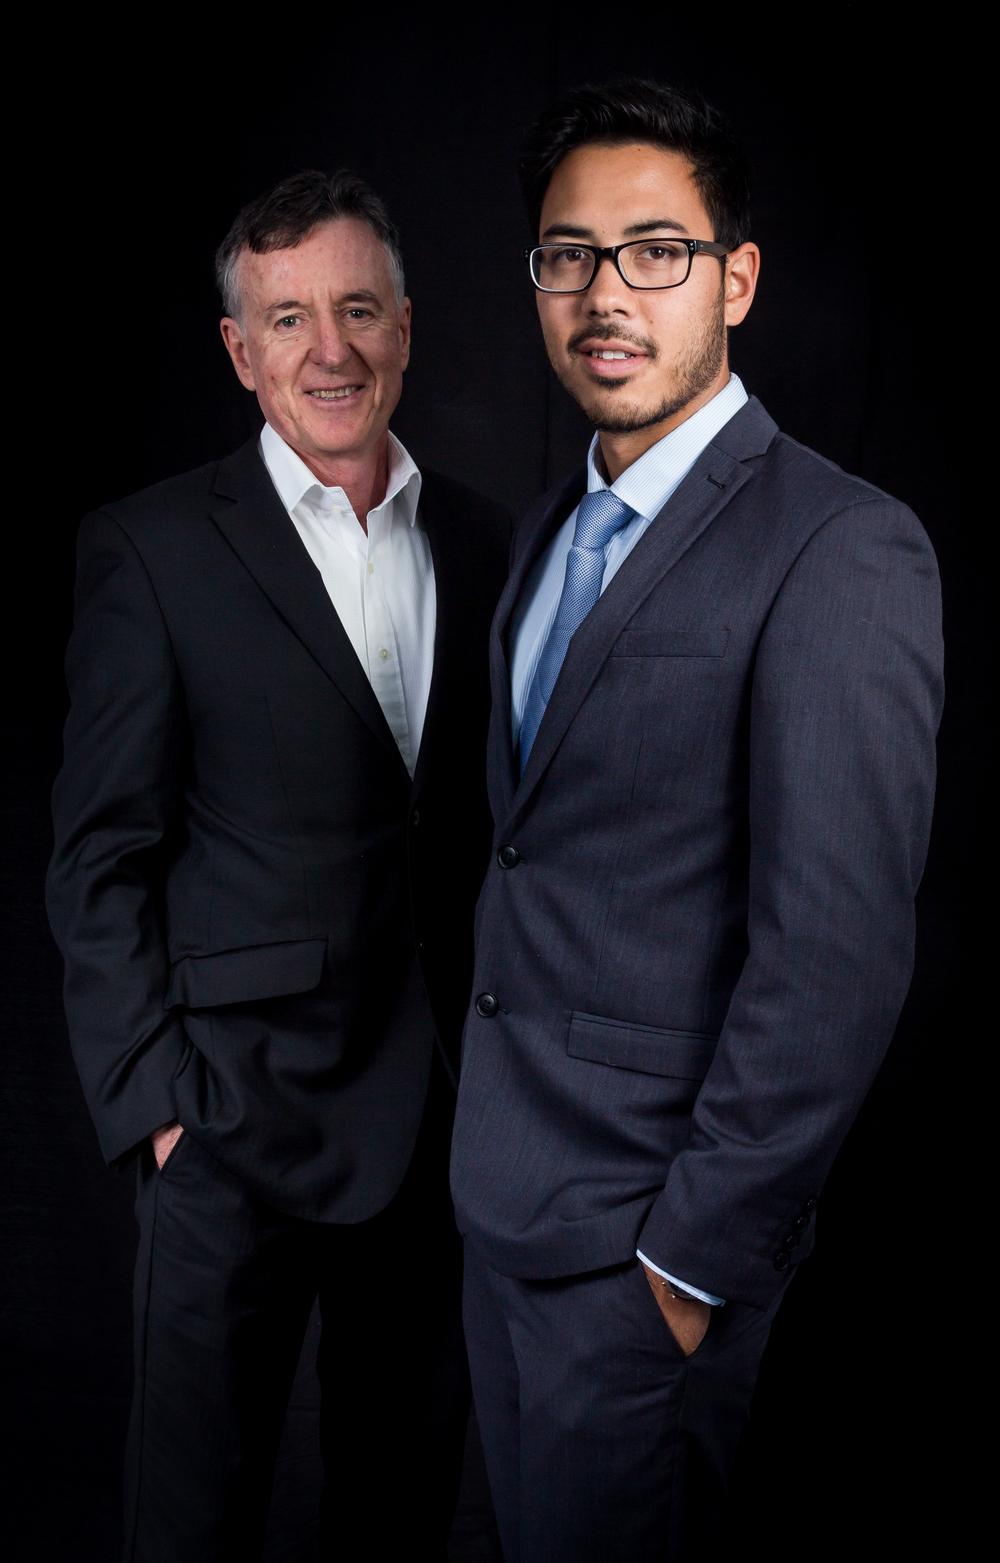 Bill and Ben Schafer - Directors